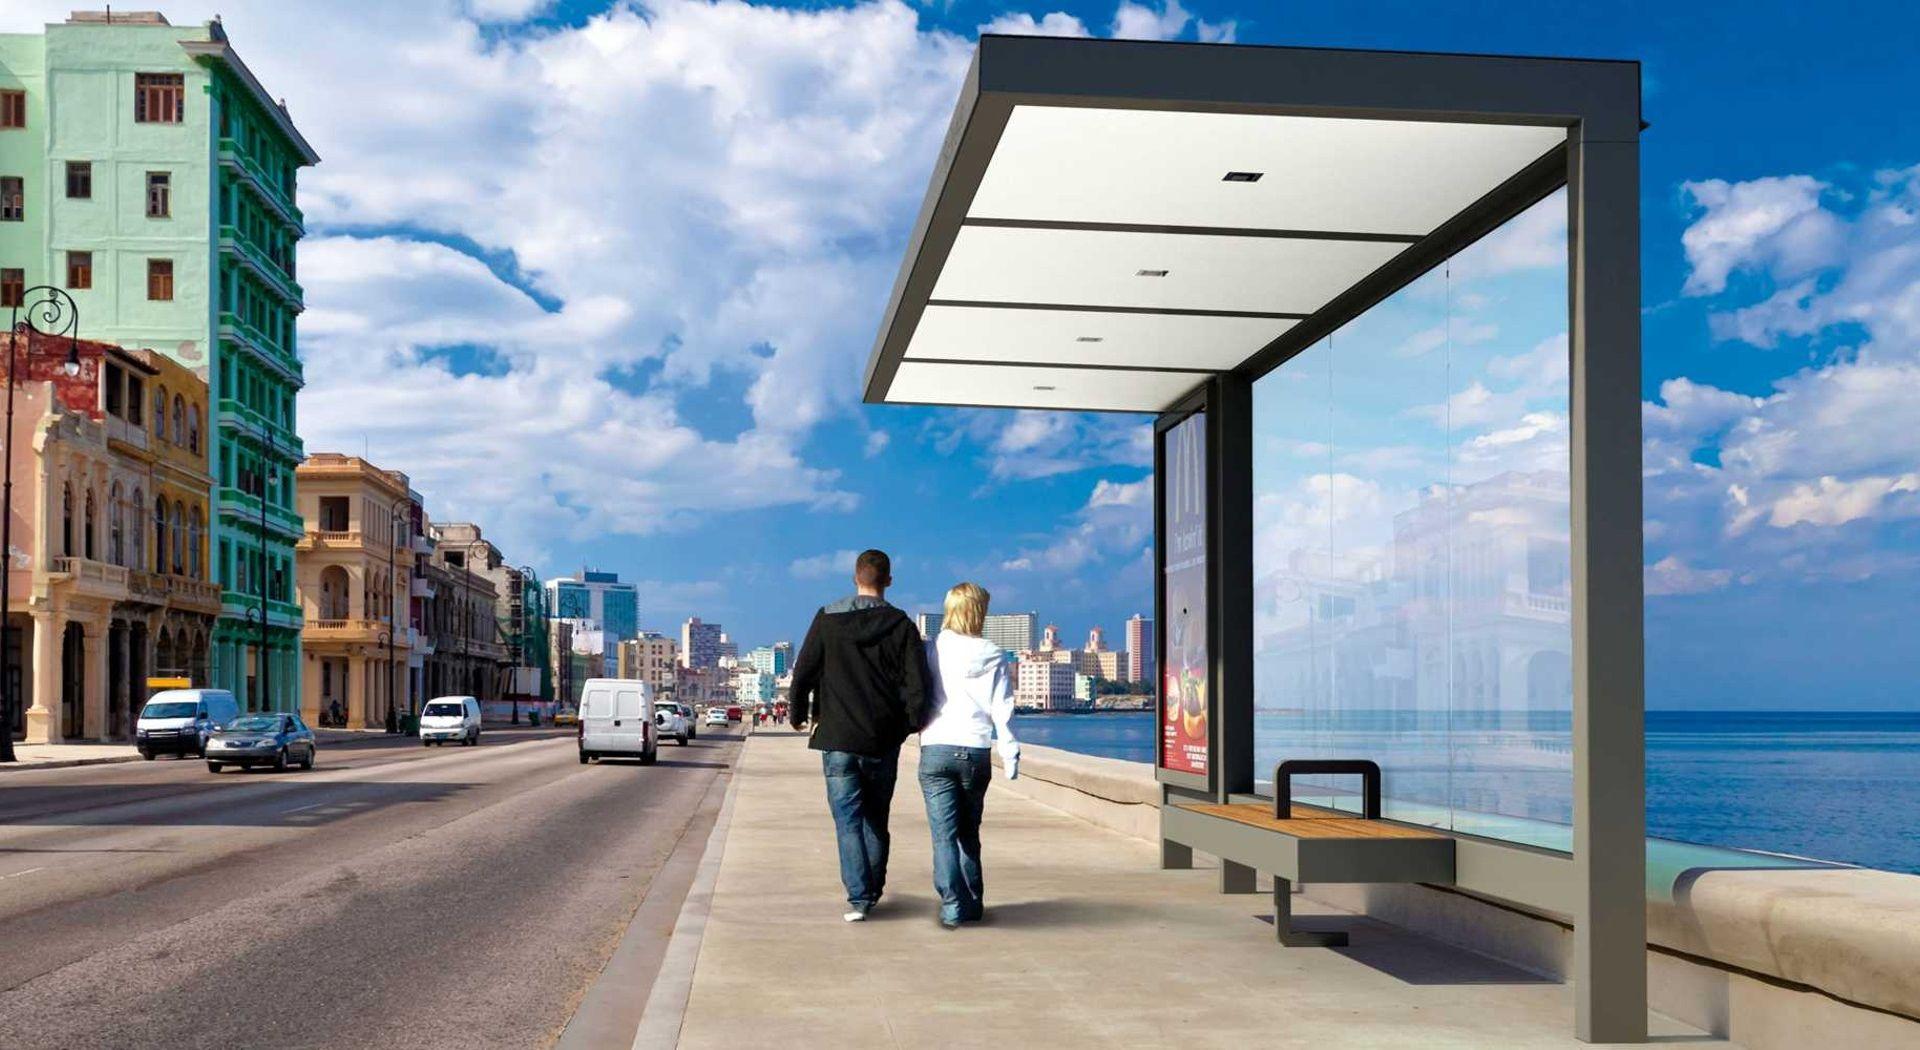 HUT abris voyageurs│METALCO fabricant d'abri bus mobilier urbain design